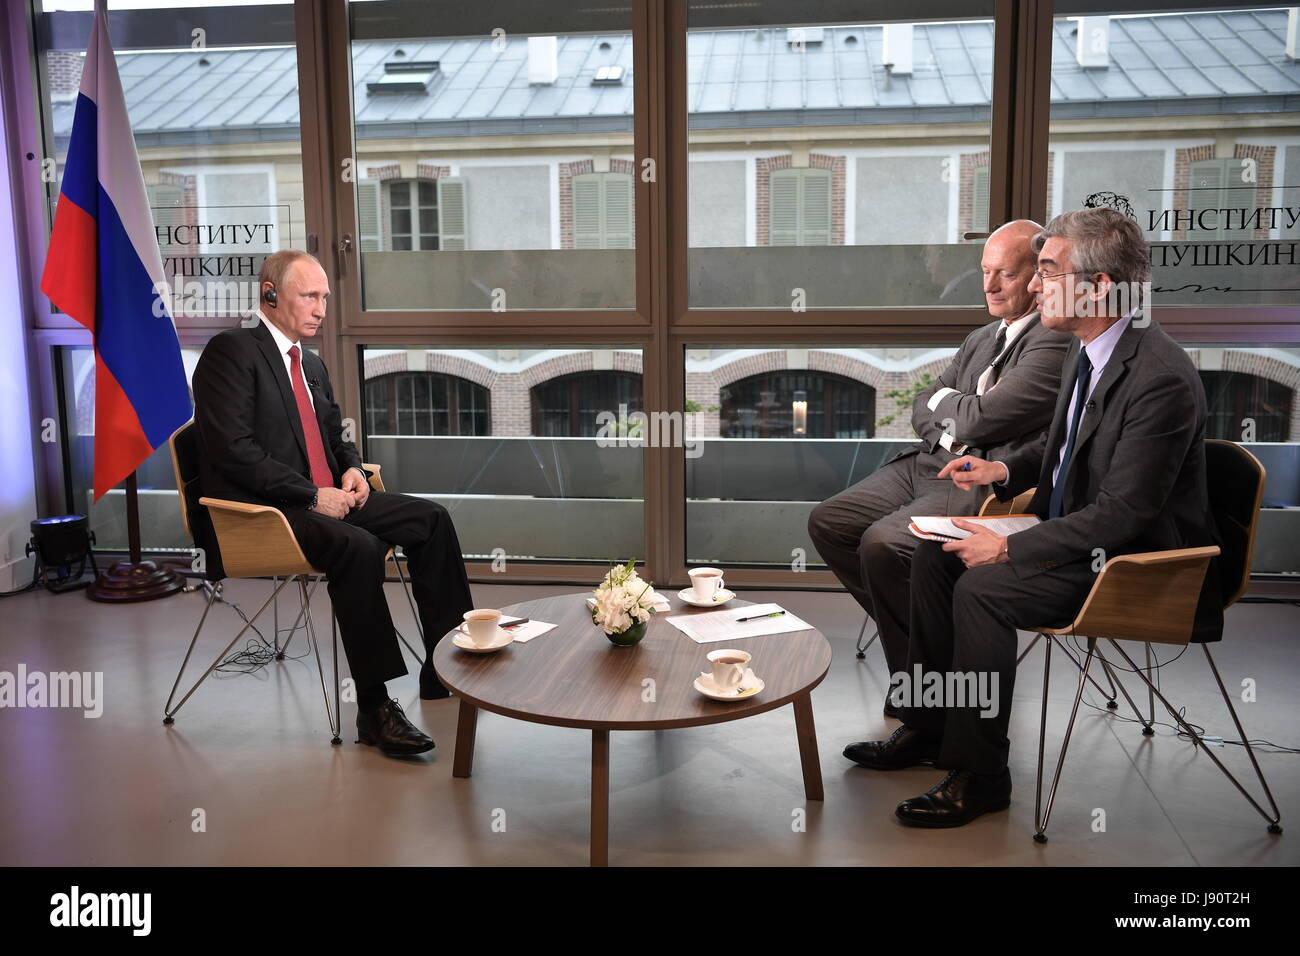 Paris france th may russia s president vladimir putin